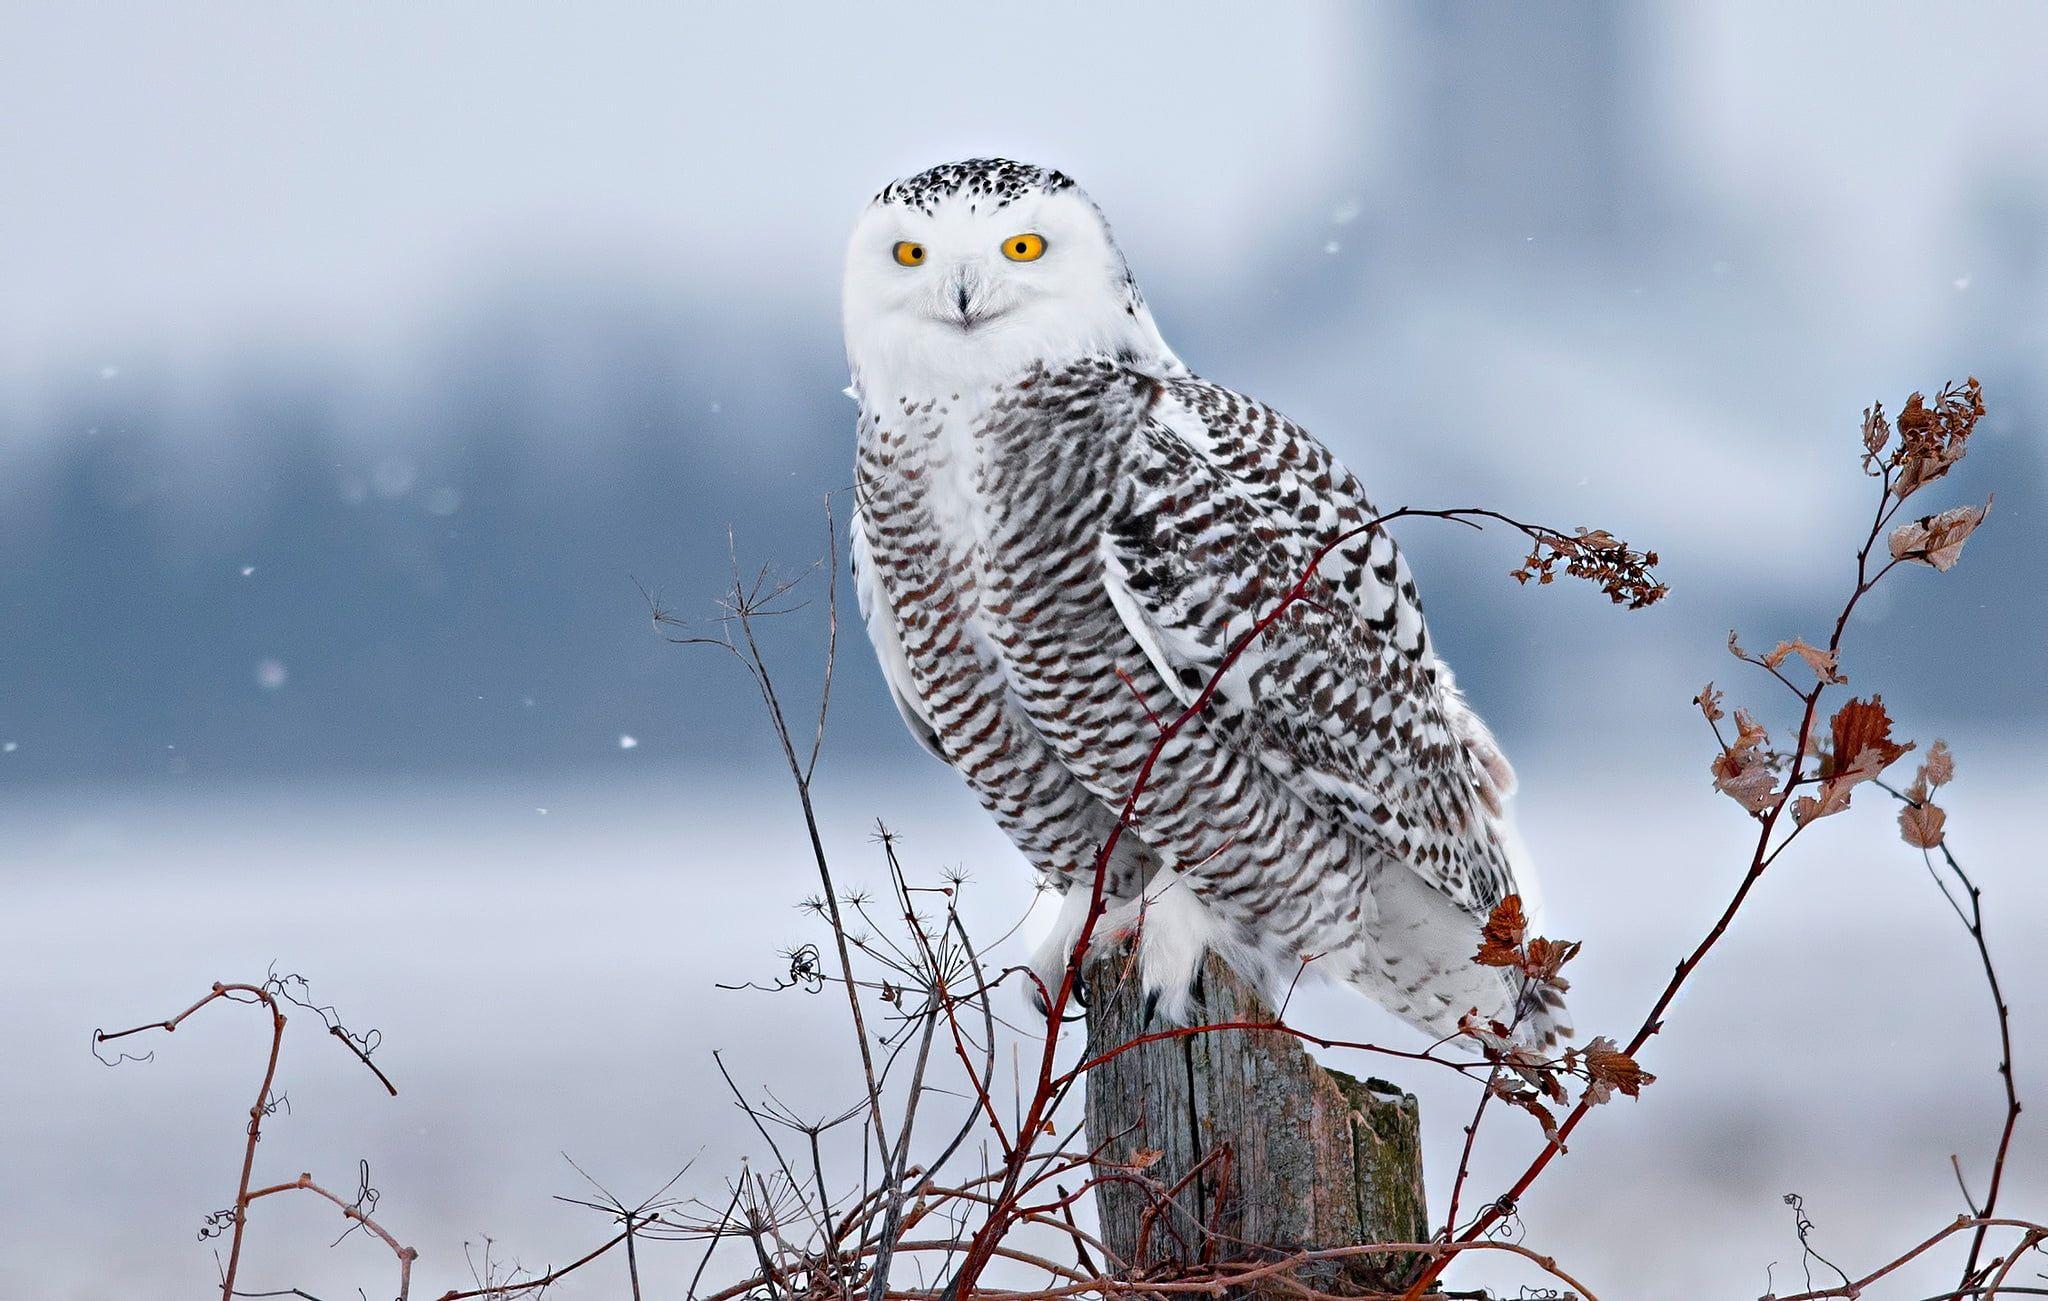 Winter Snow Branches Bird Stump Snowy Owl 1080p Wallpaper Hdwallpaper Desktop Snowy Owl Owl Wallpaper Bird